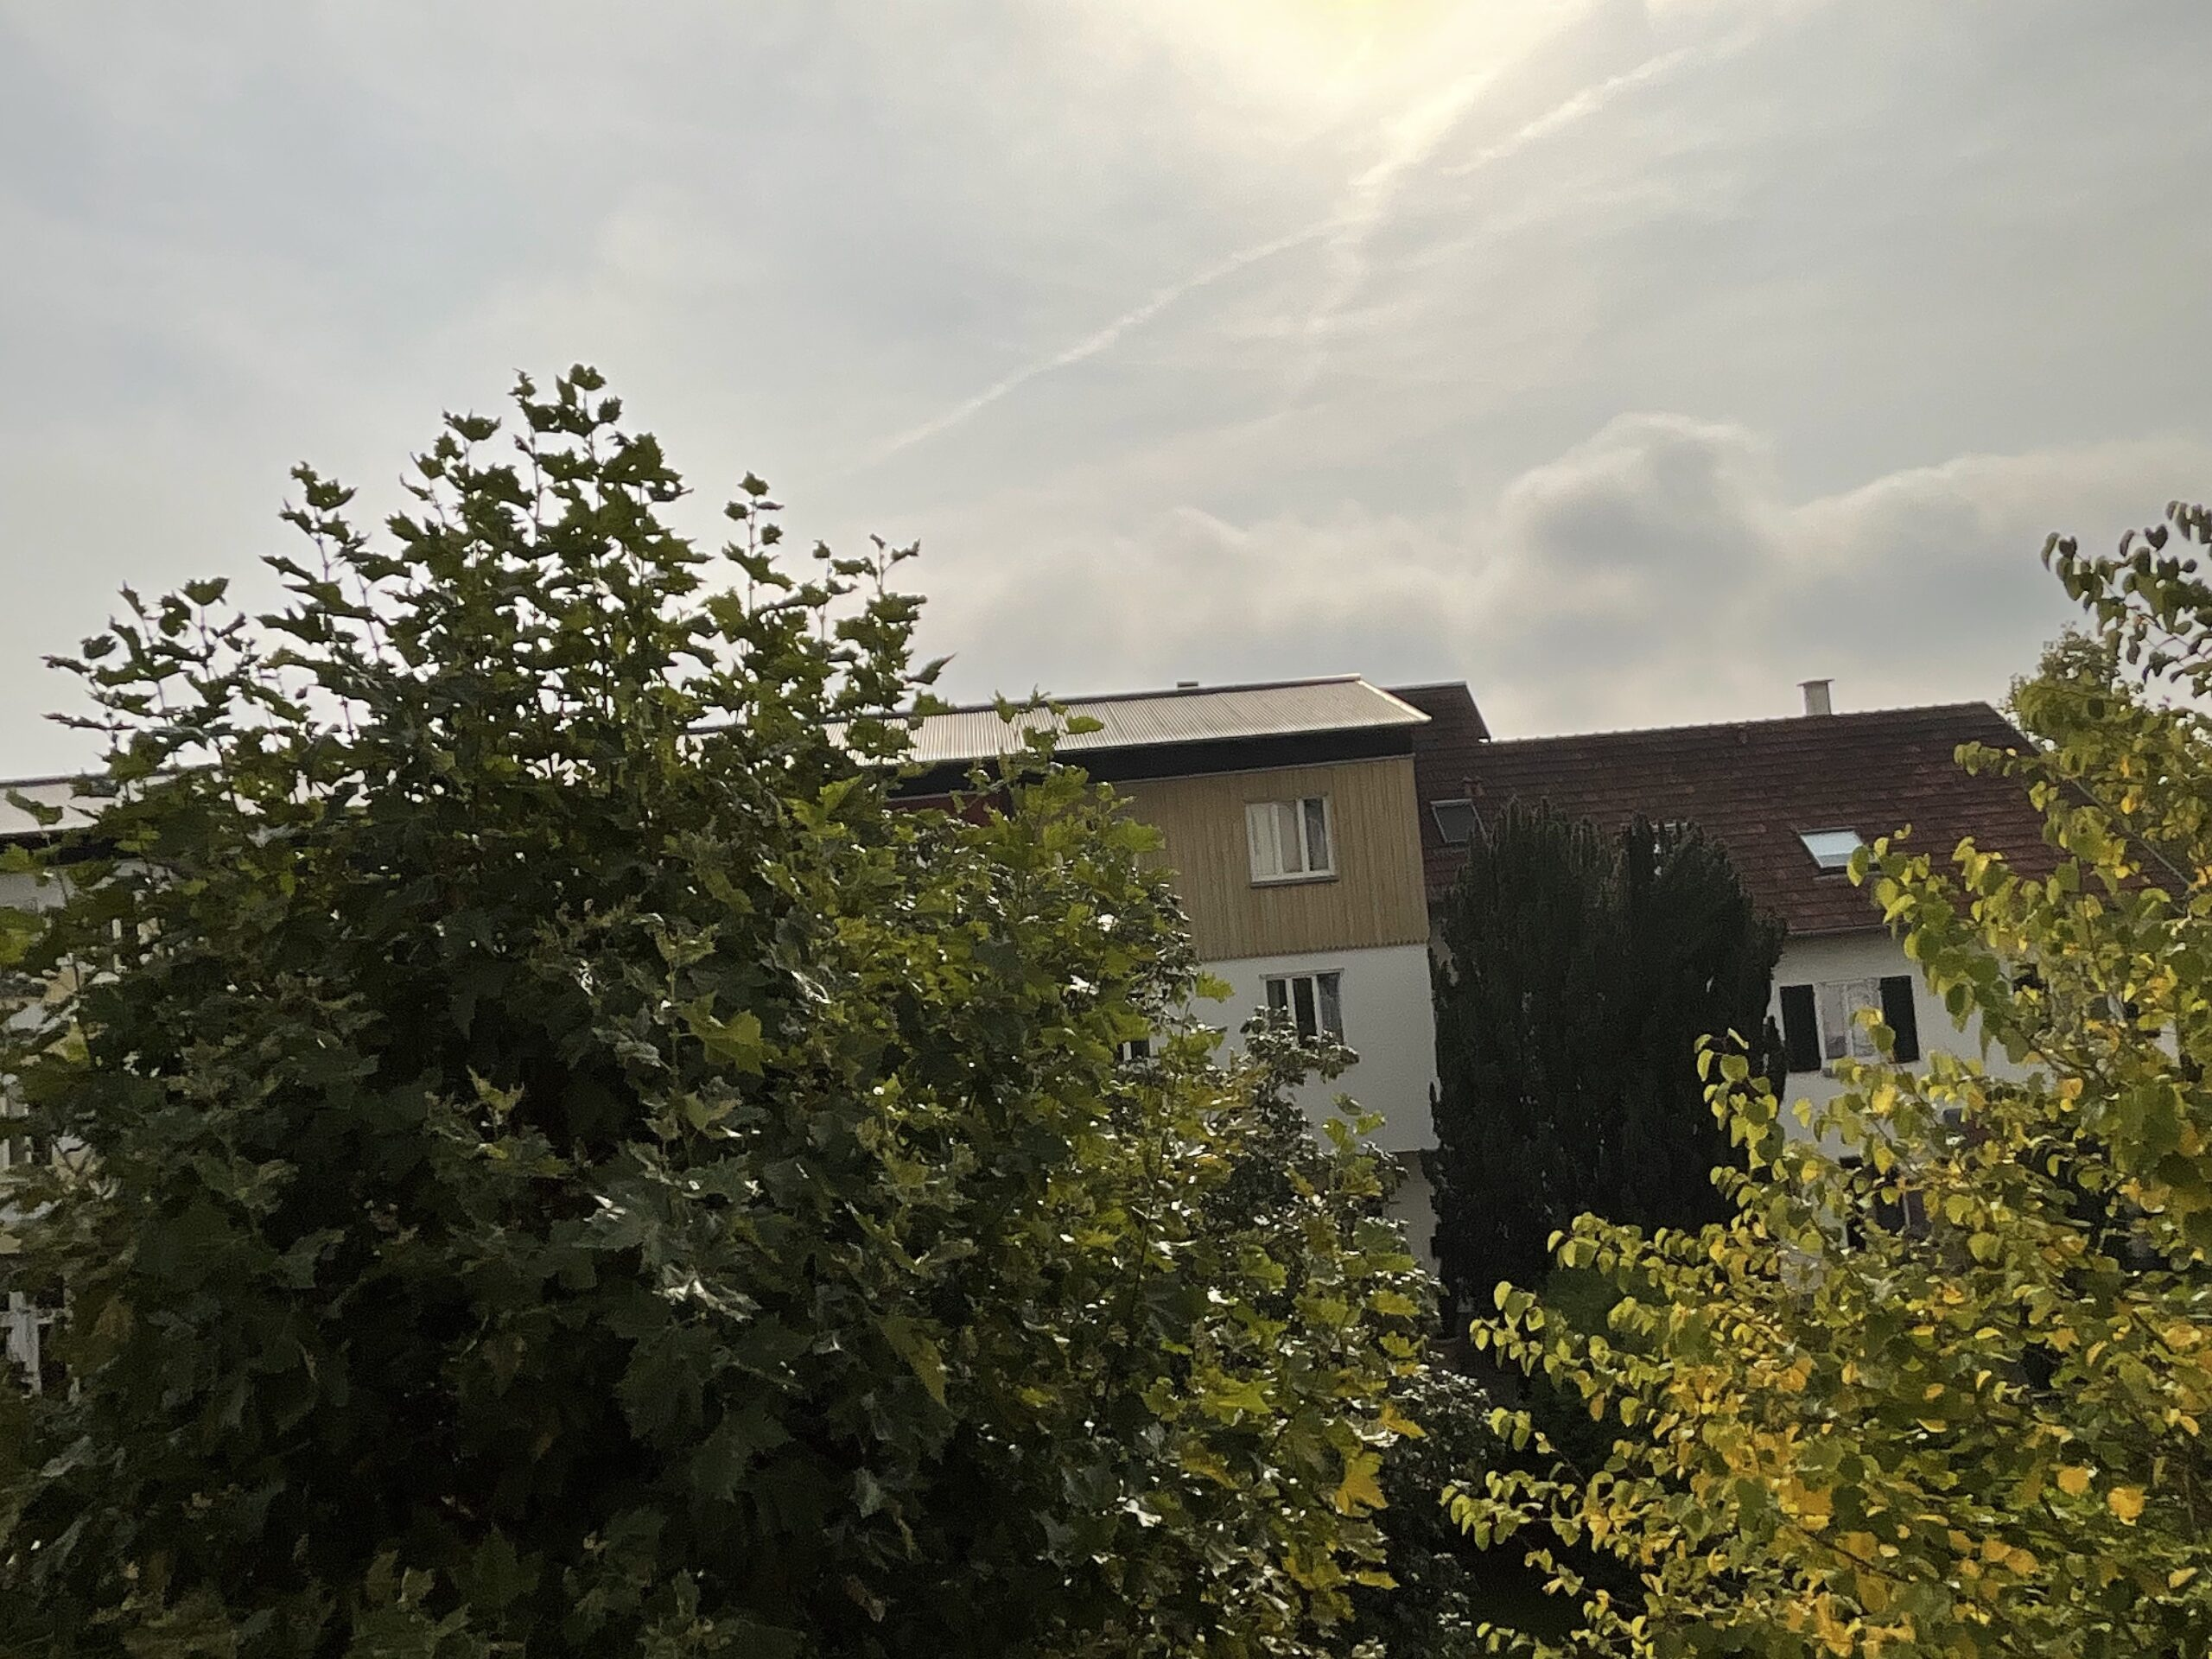 iPad mini 6 caméra avant photo maisons